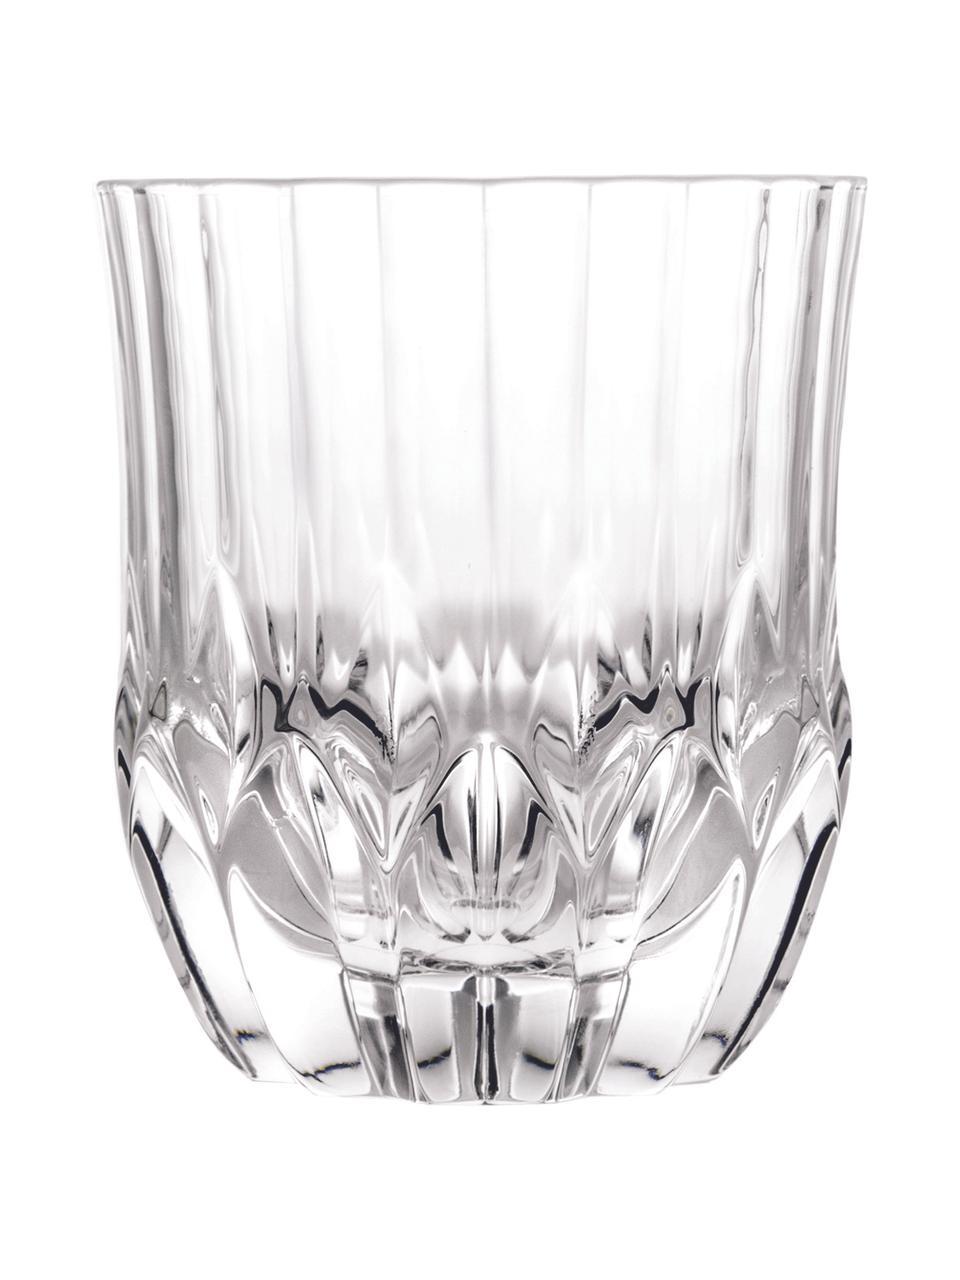 Kristallgläser Adagio mit Relief, 6 Stück, Kristallglas, Transparent, Ø 9 x H 10 cm. 350 ml